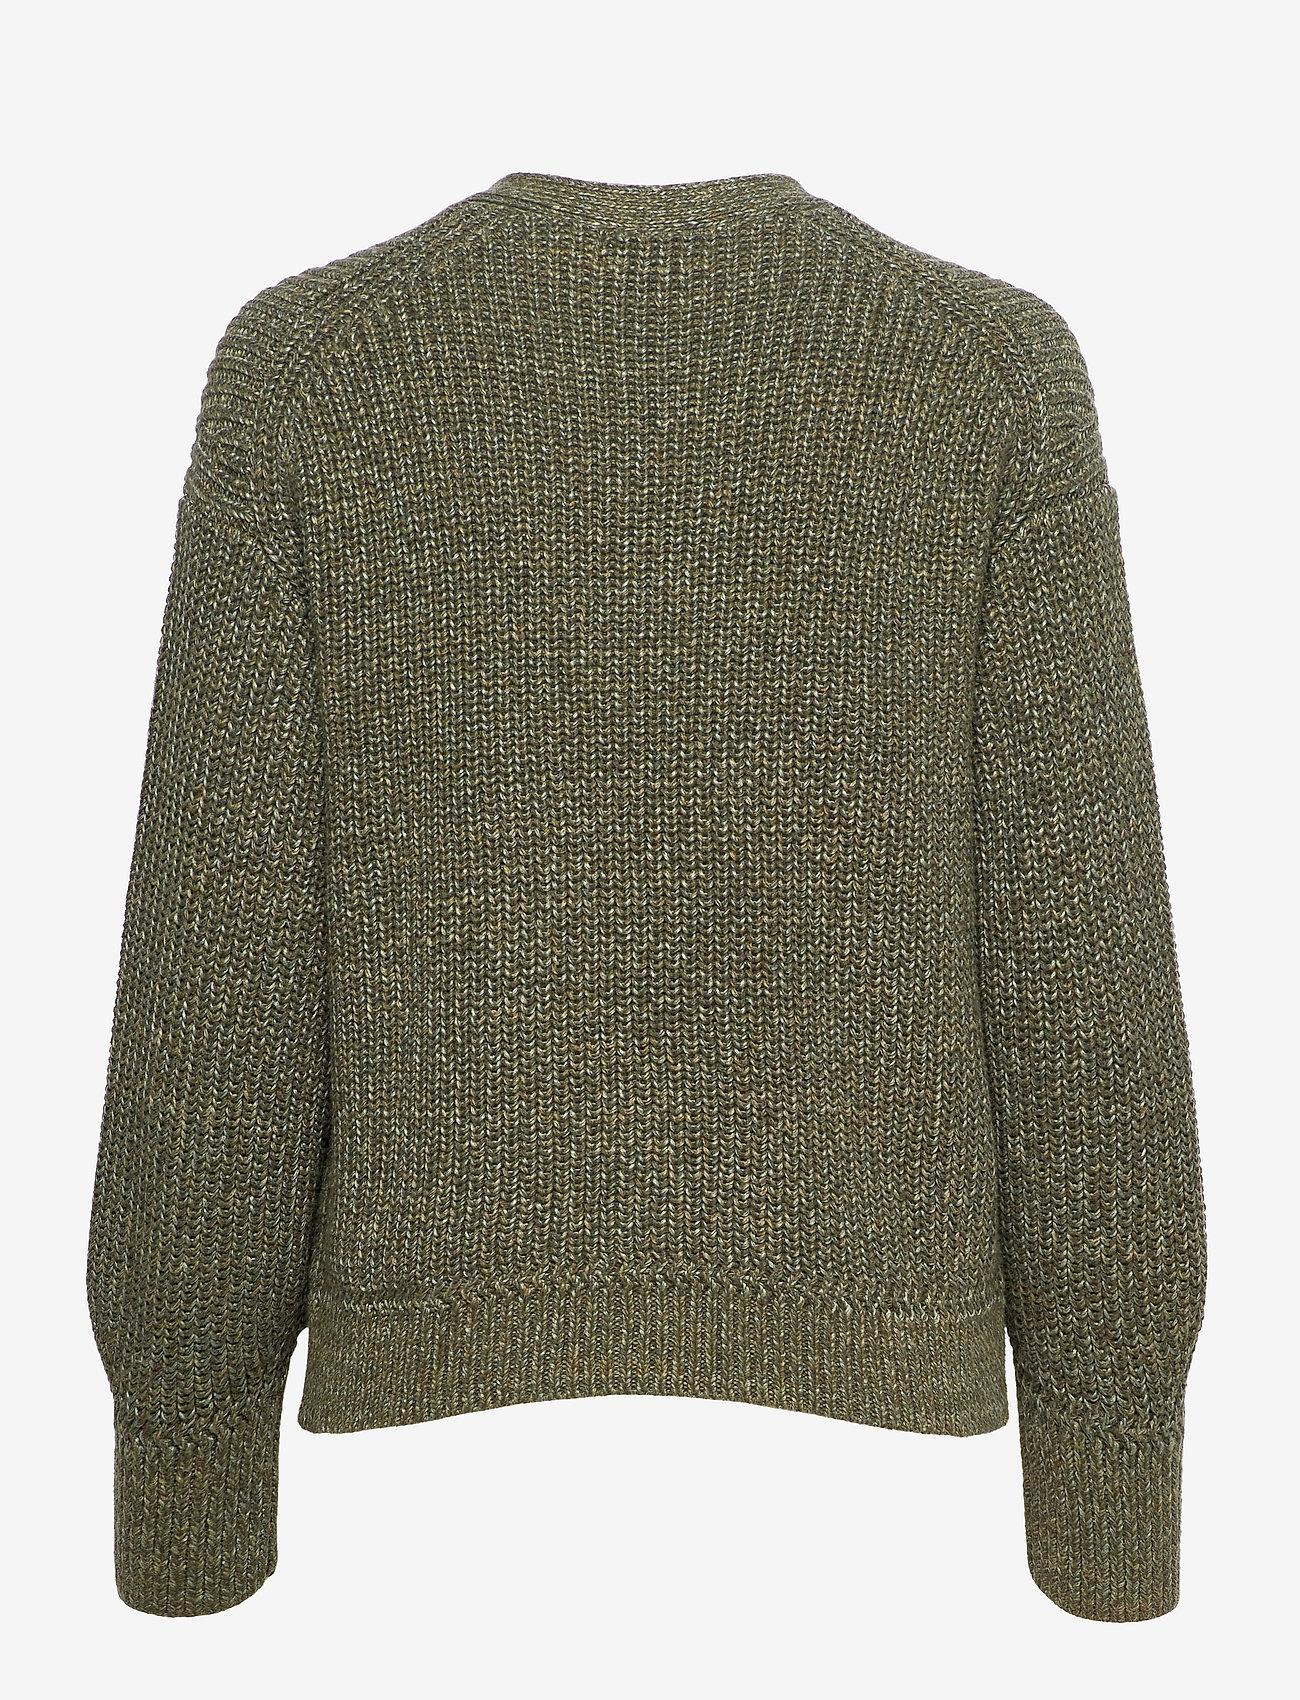 Polo Ralph Lauren - BLN SLV CARD-LONG SLEEVE-SWEATER - cardigans - olive - 1